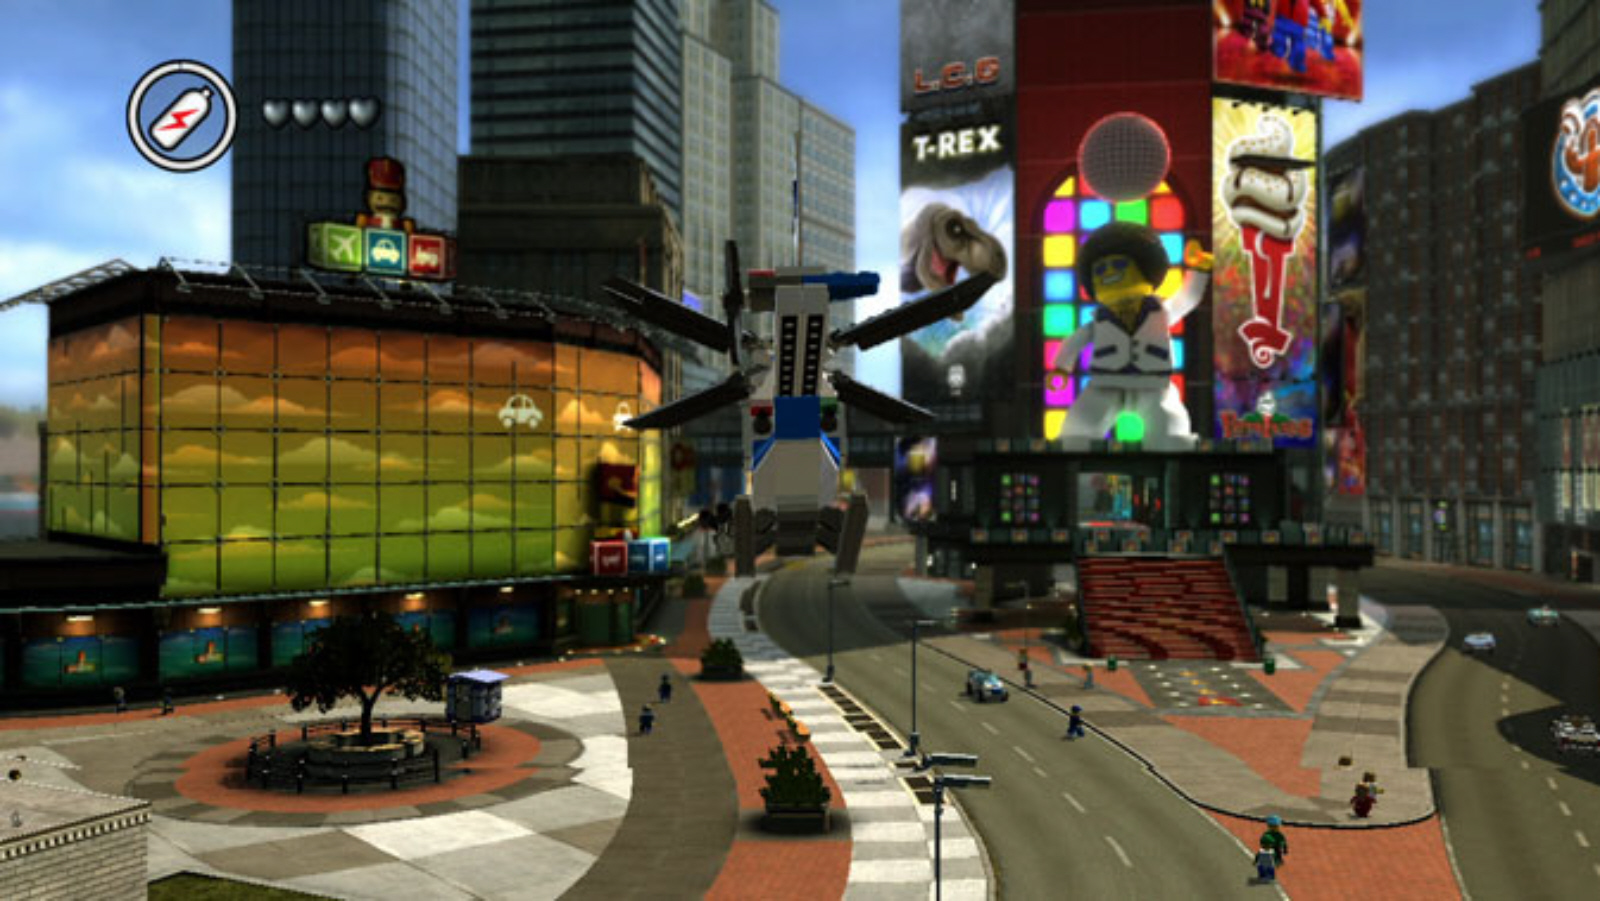 lego-city-undercover-wii-u-helicopter-flying-gameplay-screenshot.jpg (1600×901)